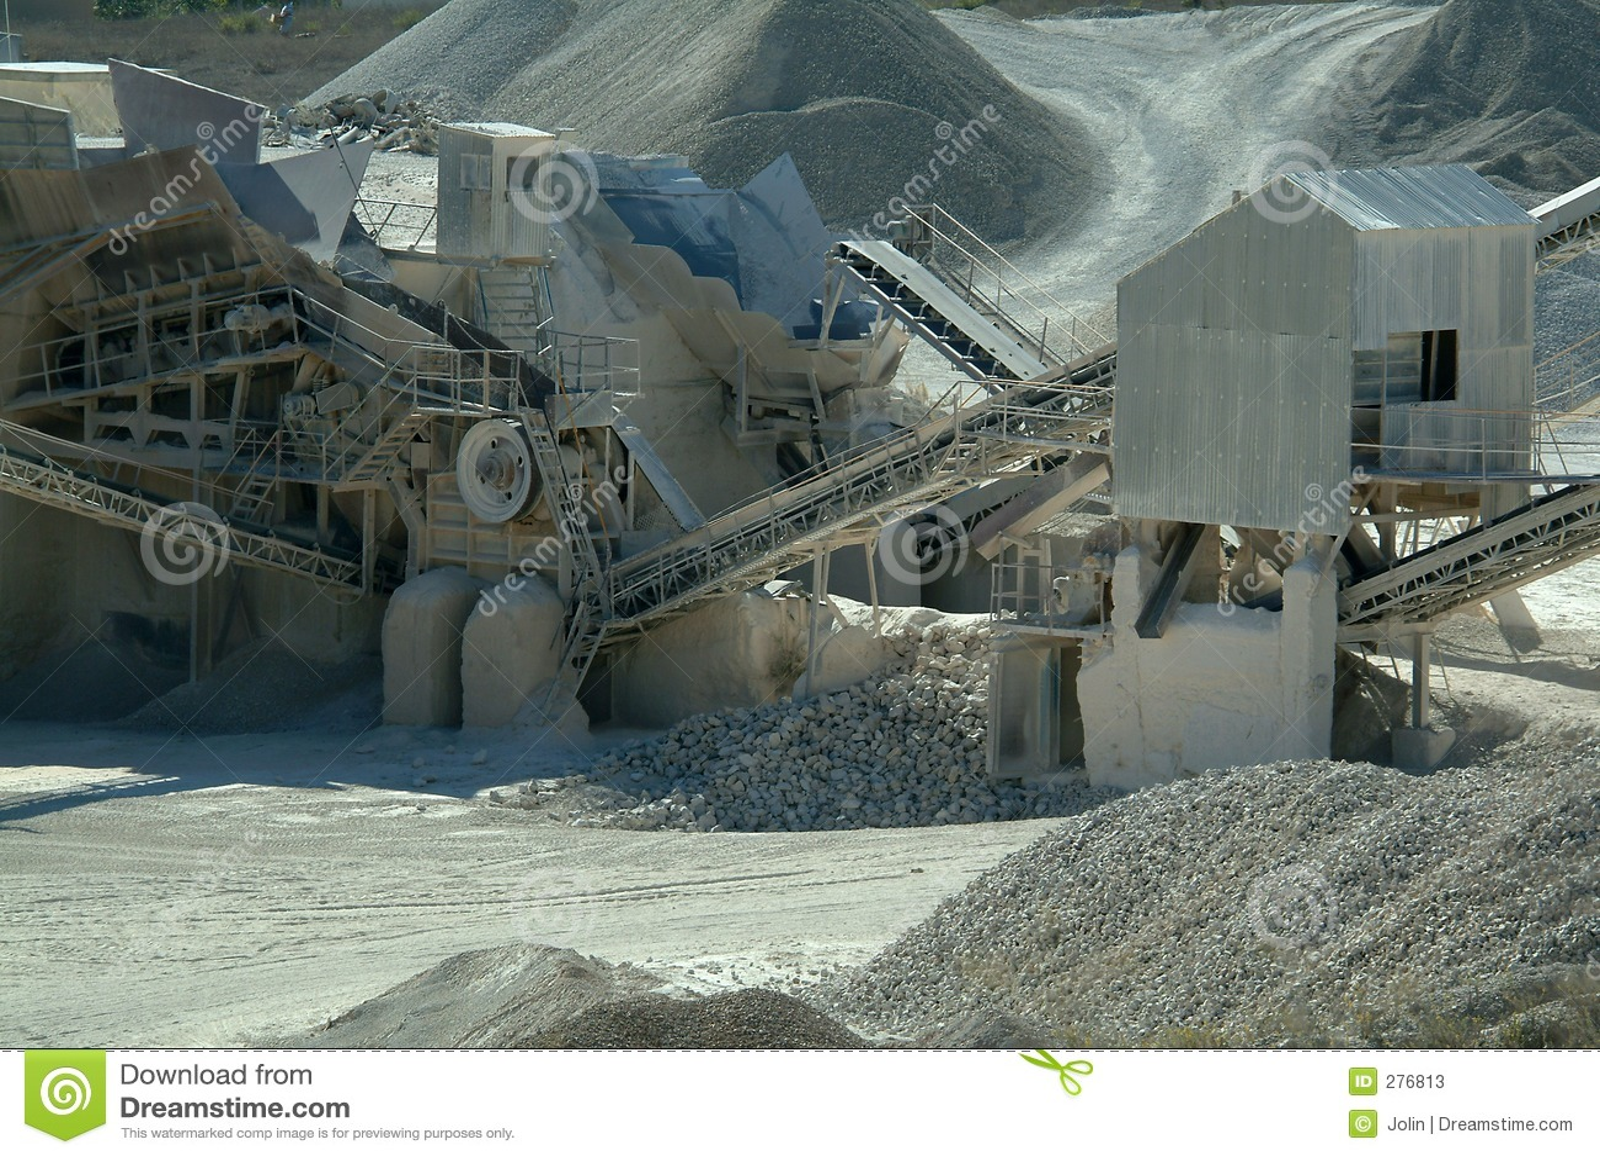 rock quarry business plan